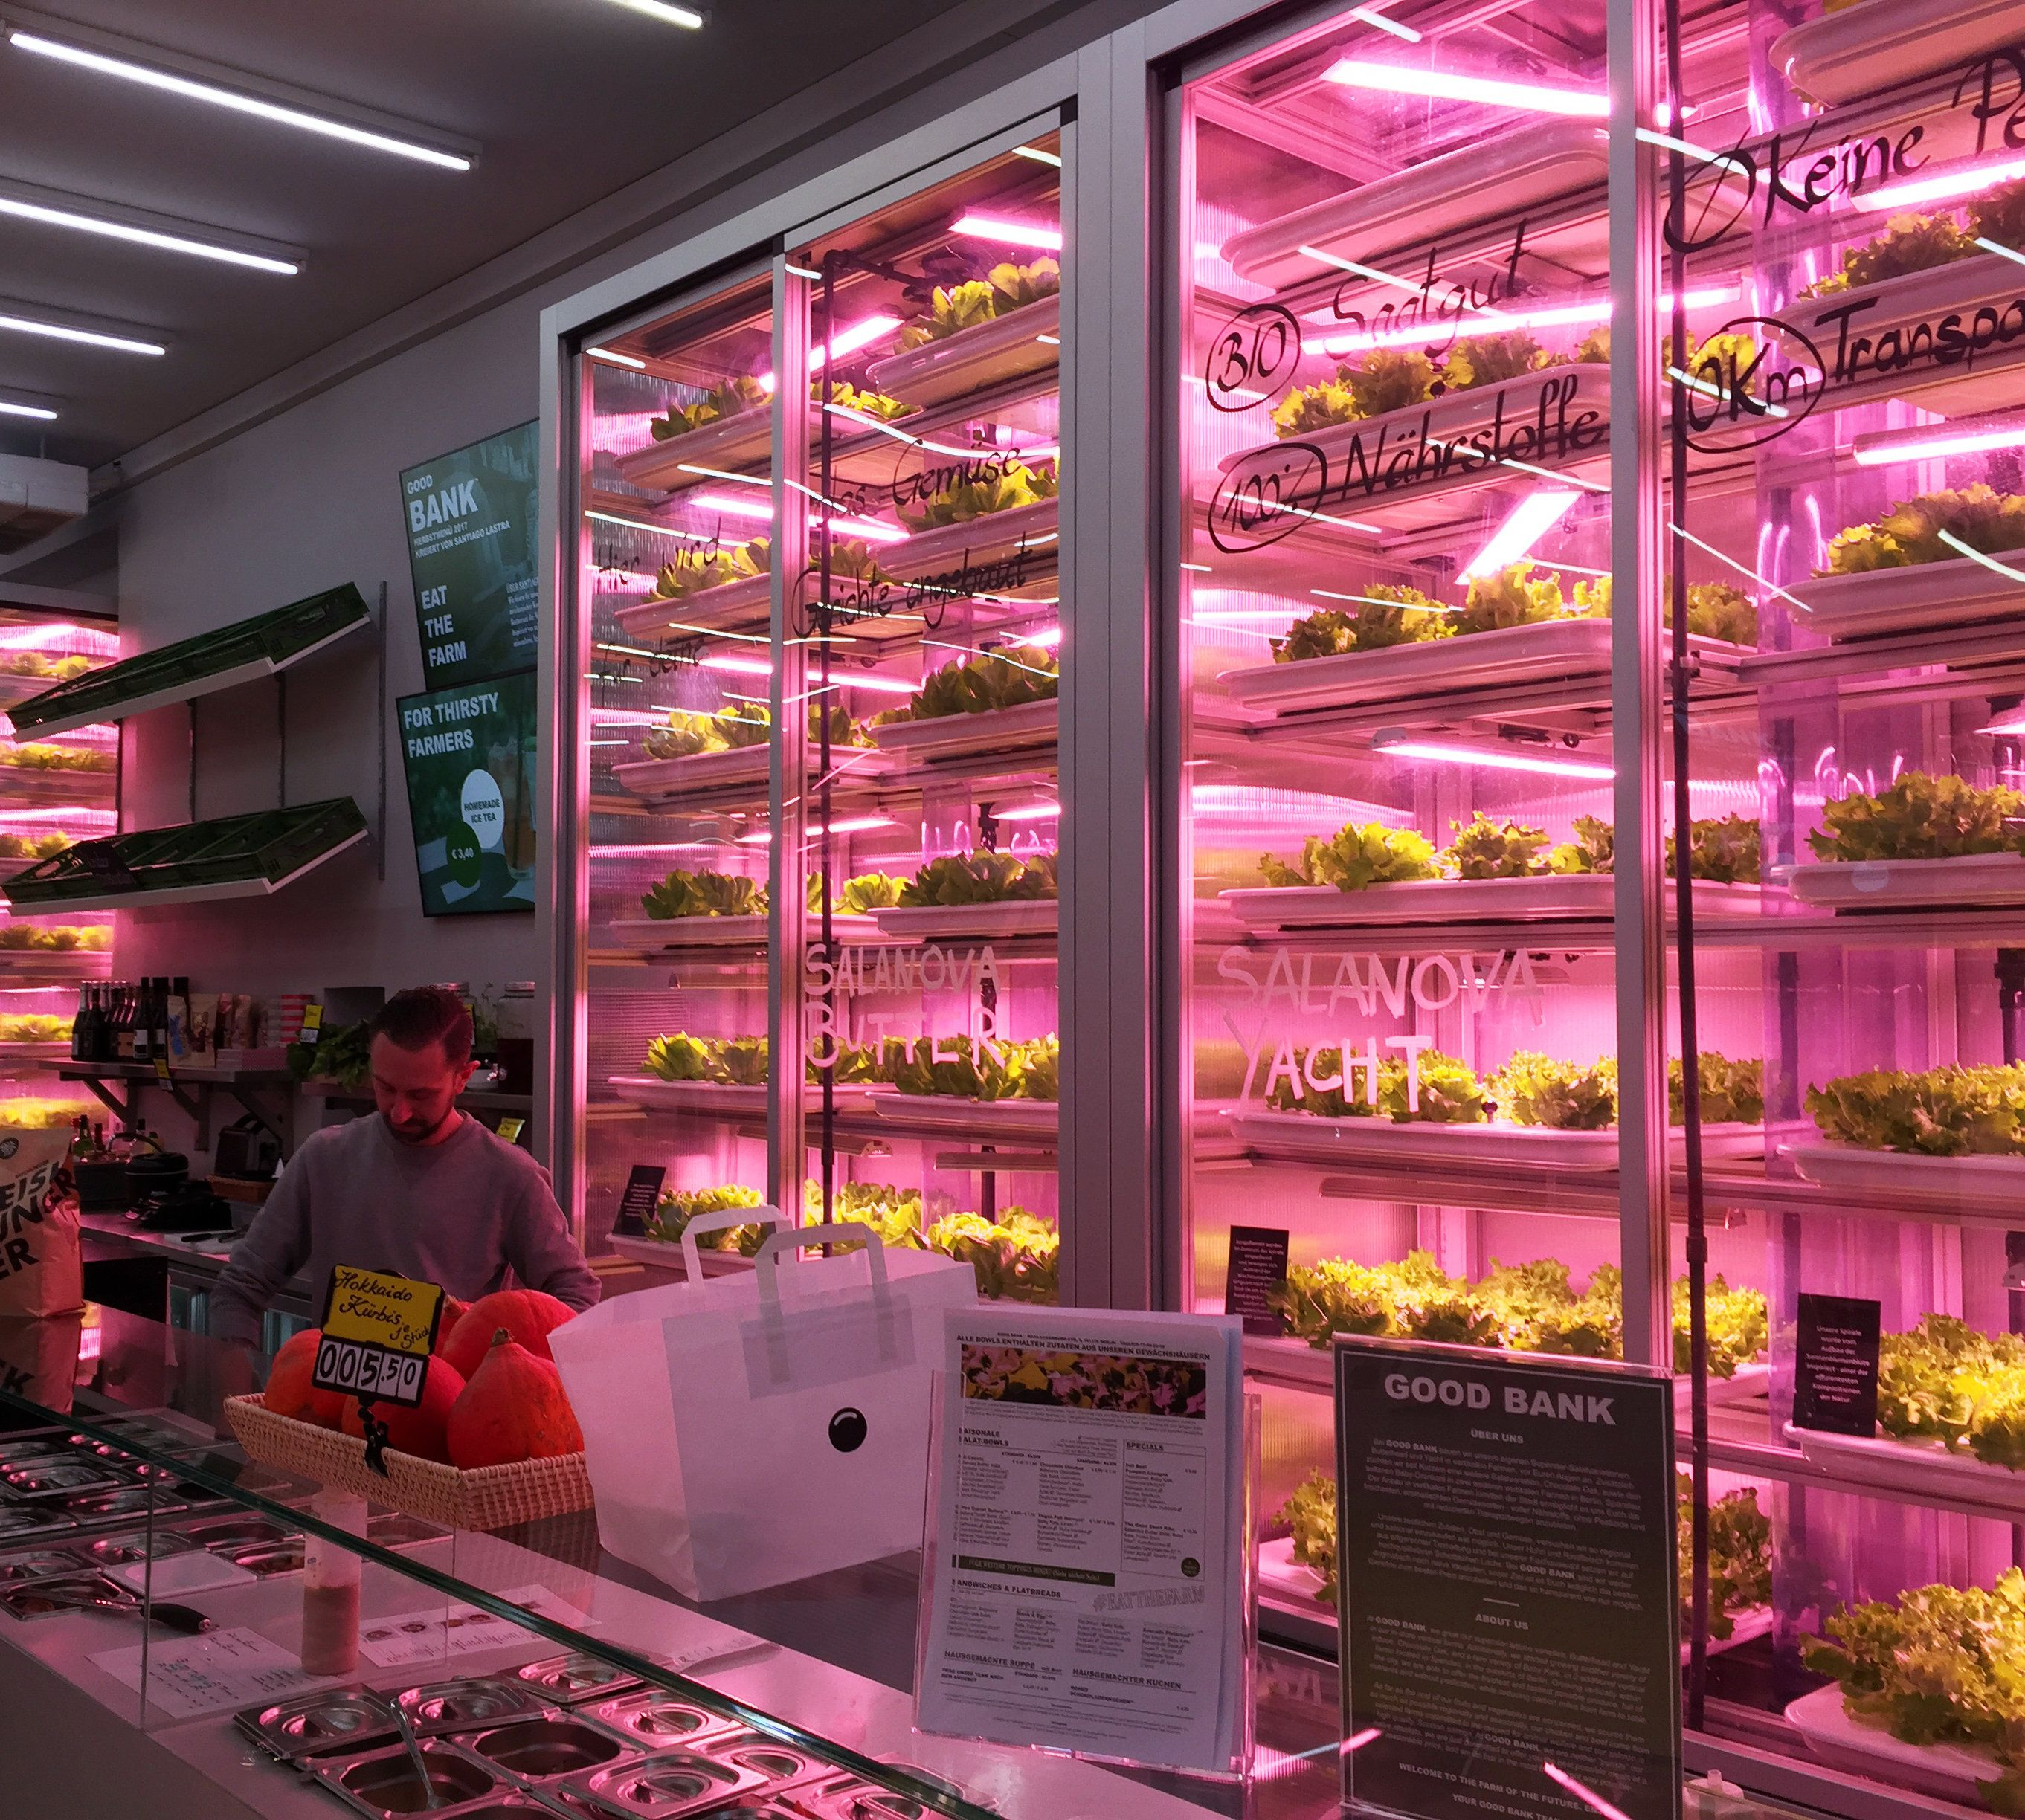 Good Bank vertical farm restaurant Berlin. Photo: Lexis ...